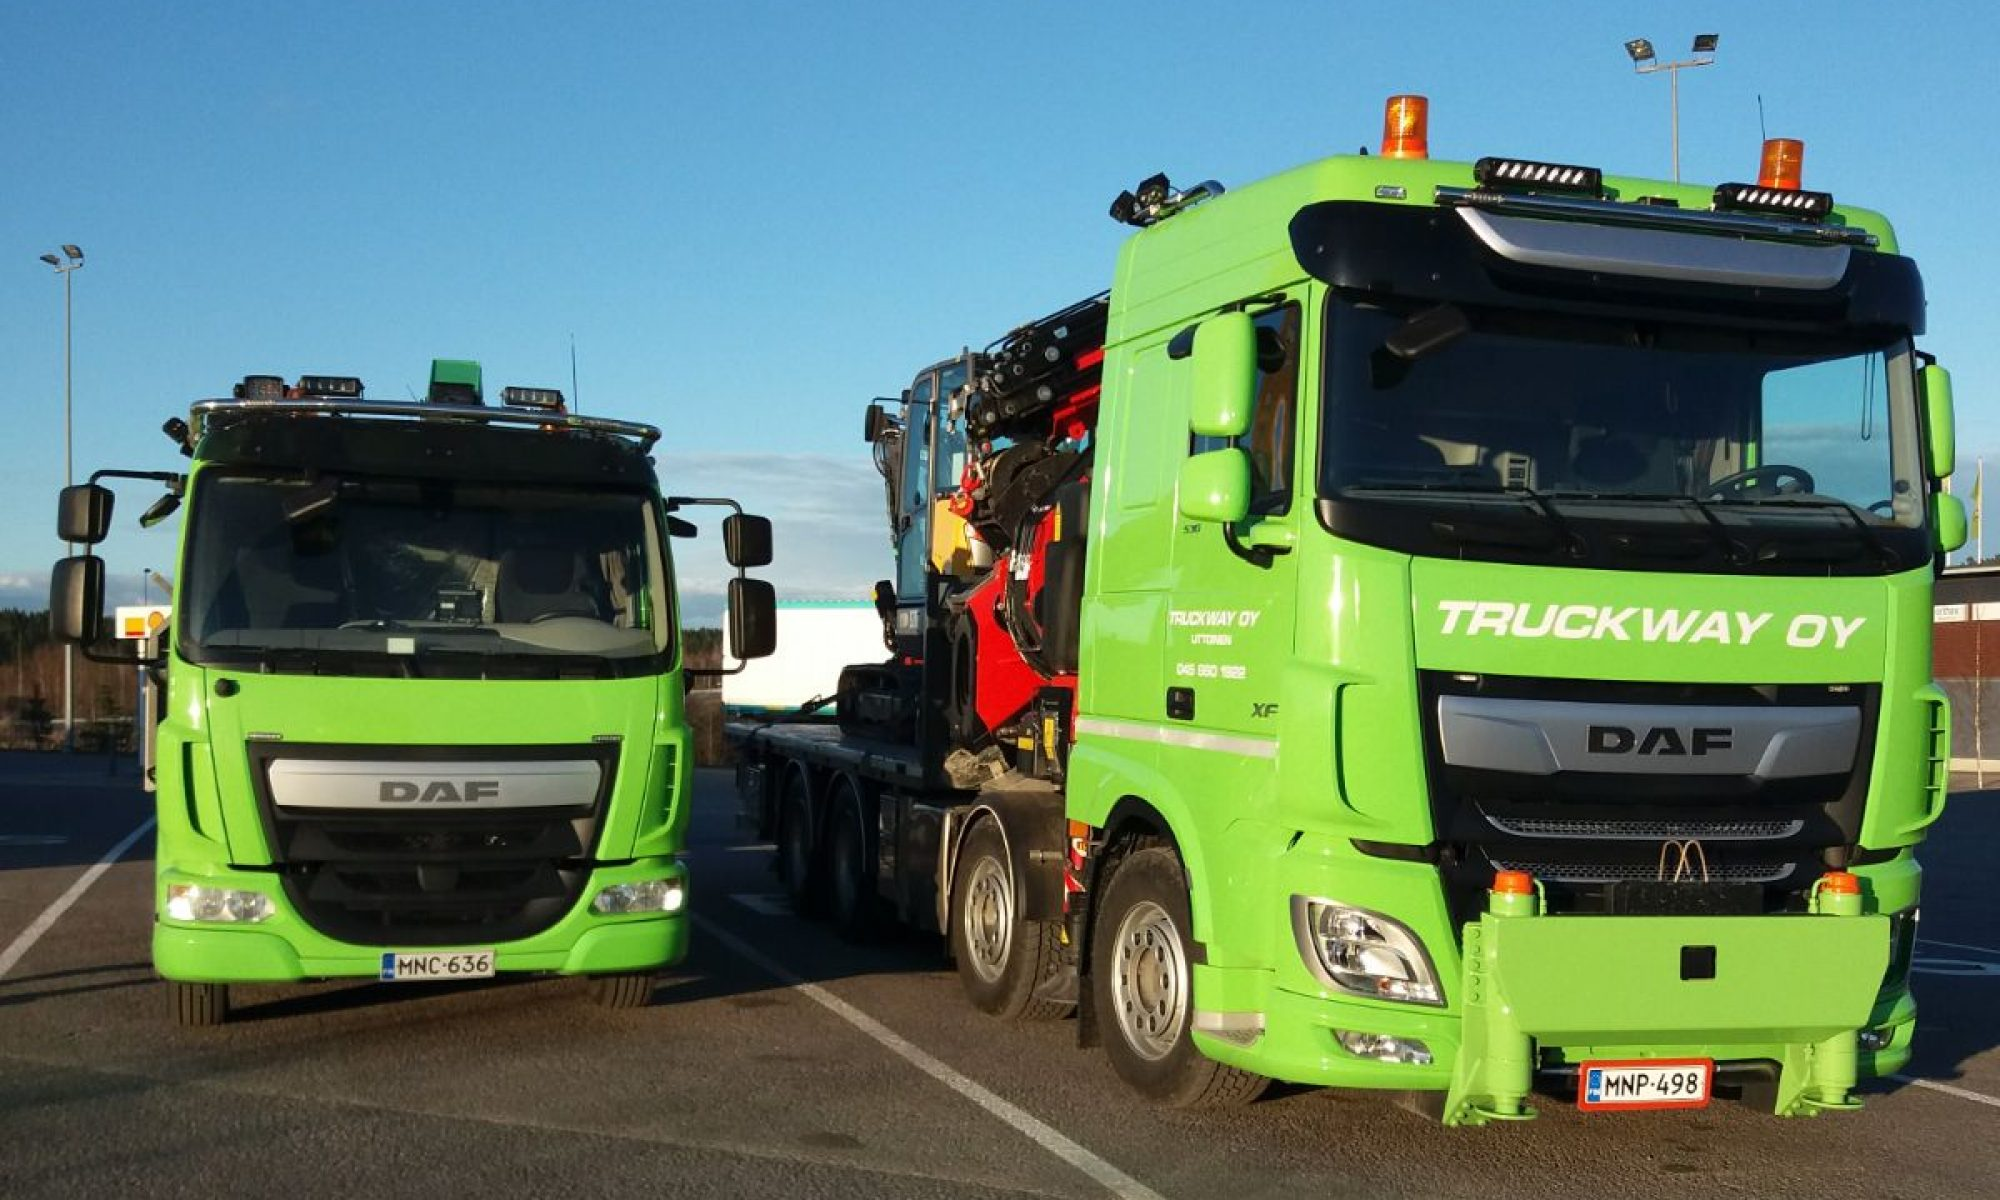 Truckway Oy